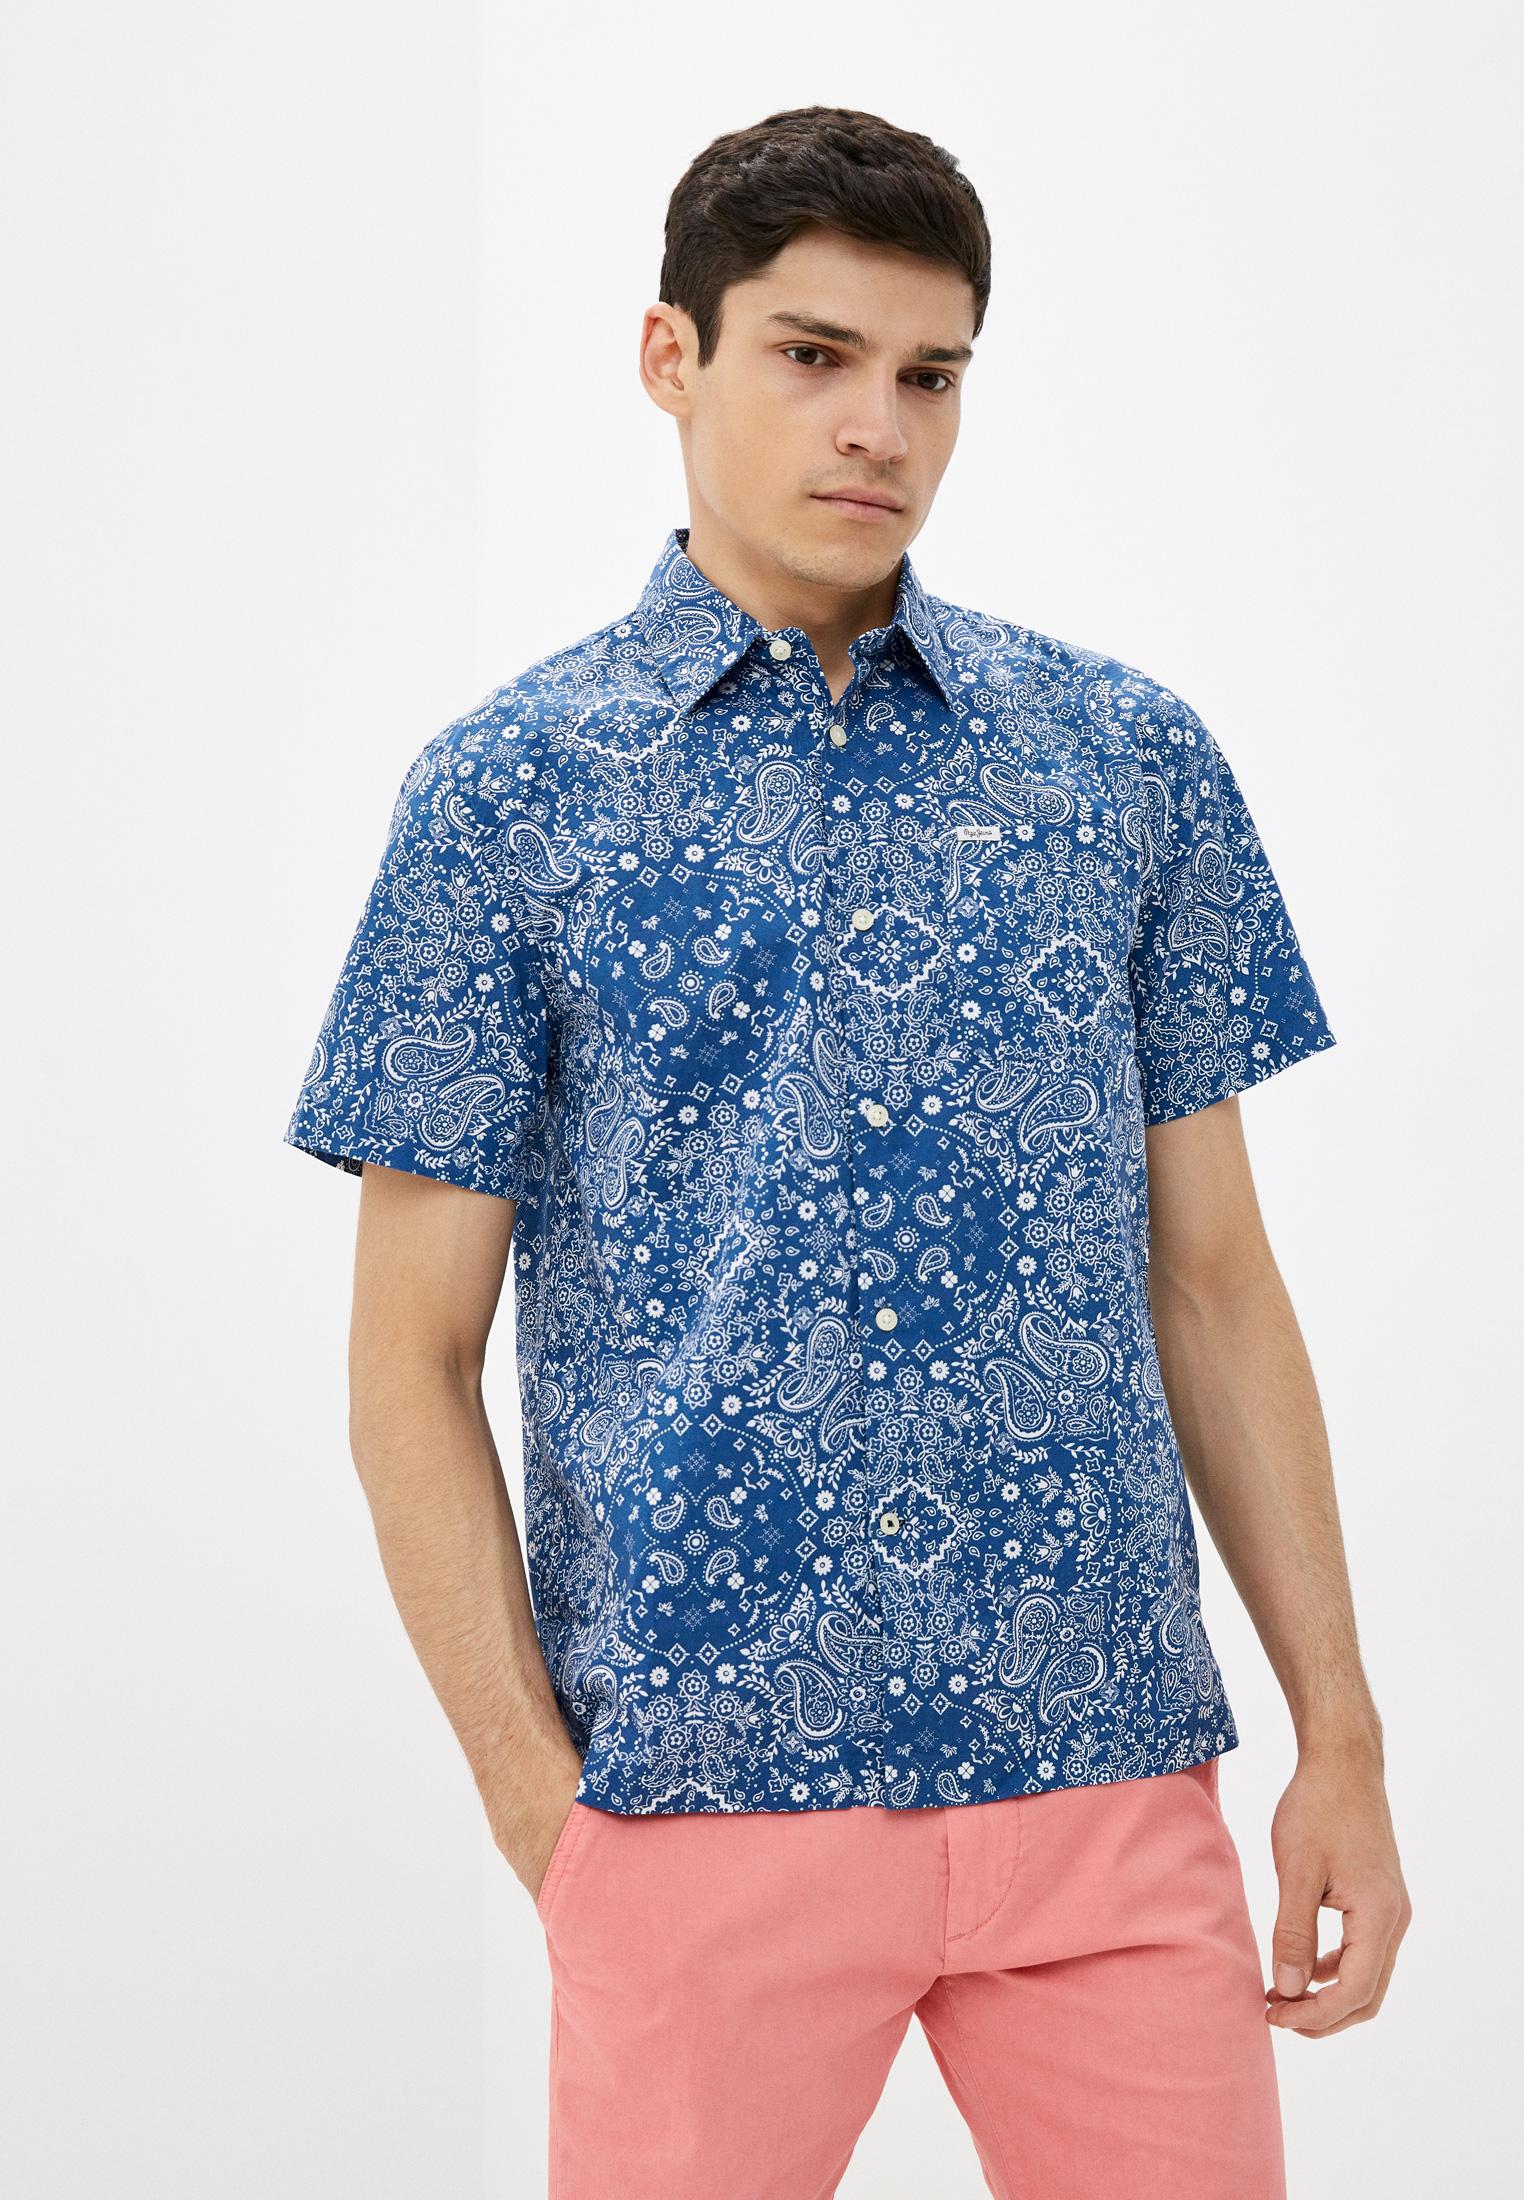 Рубашка с длинным рукавом Pepe Jeans (Пепе Джинс) PM307077